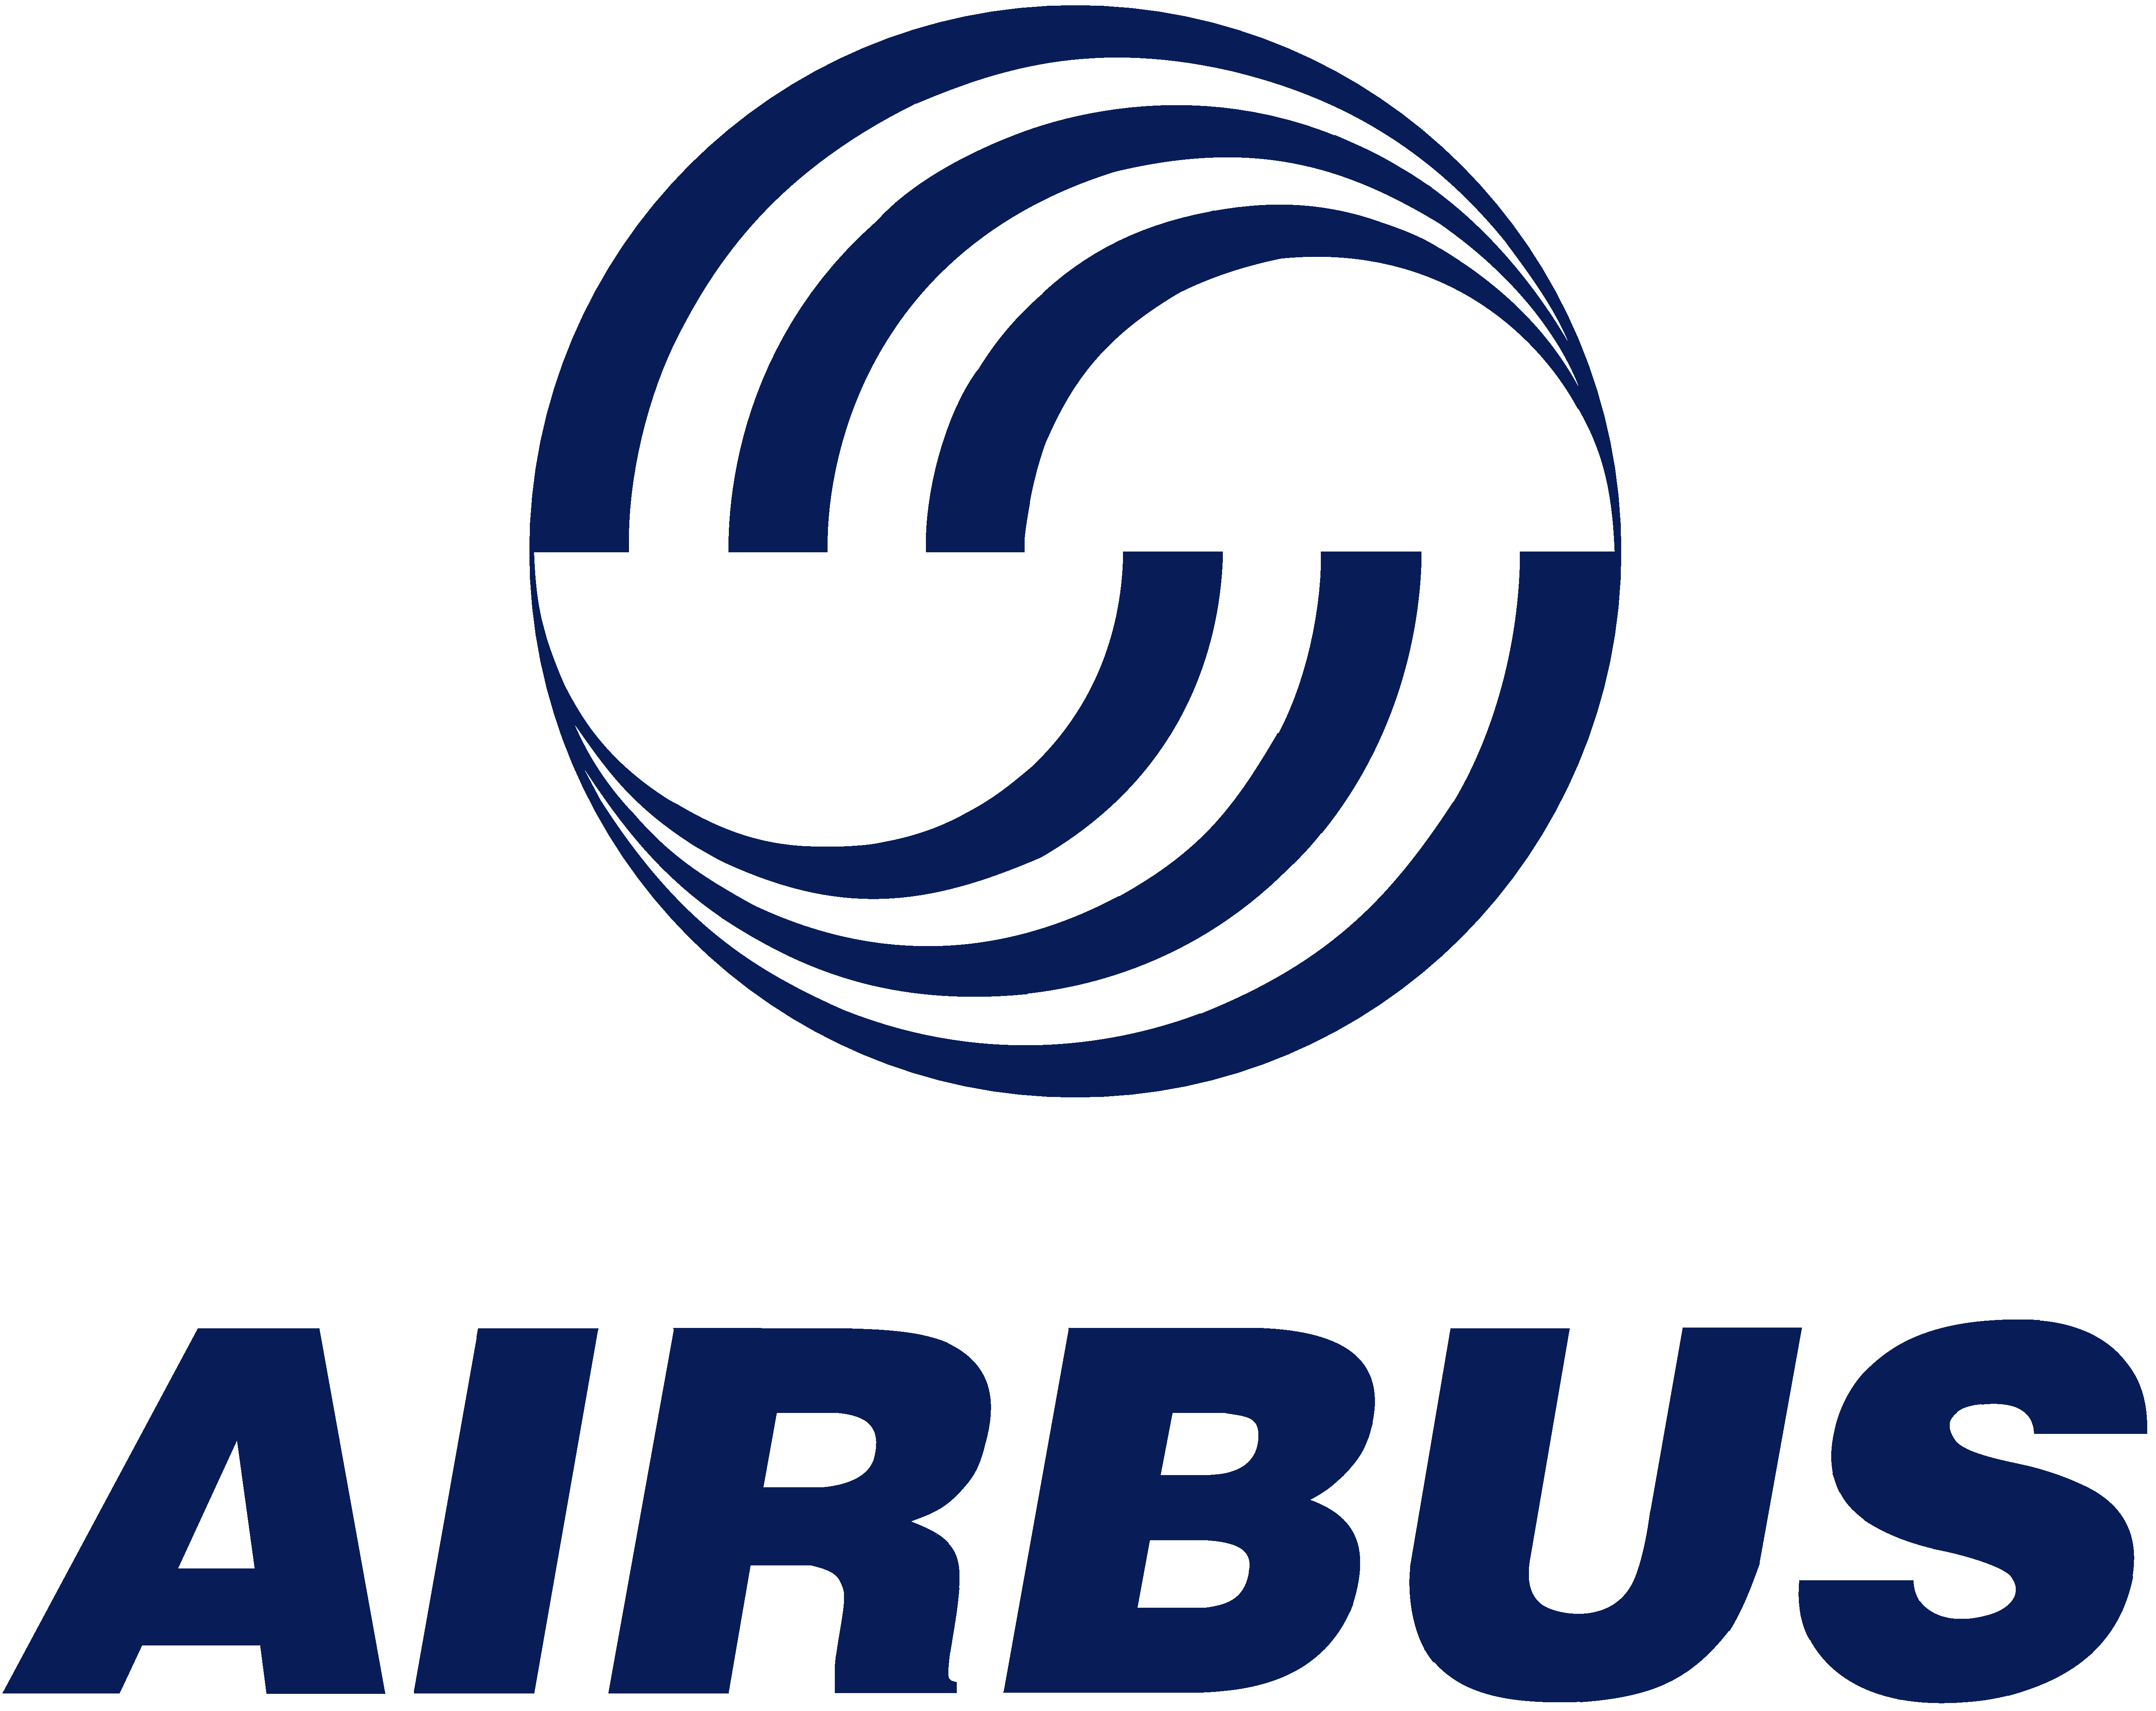 Airbus Logo vector by WindyThePlaneh on DeviantArt